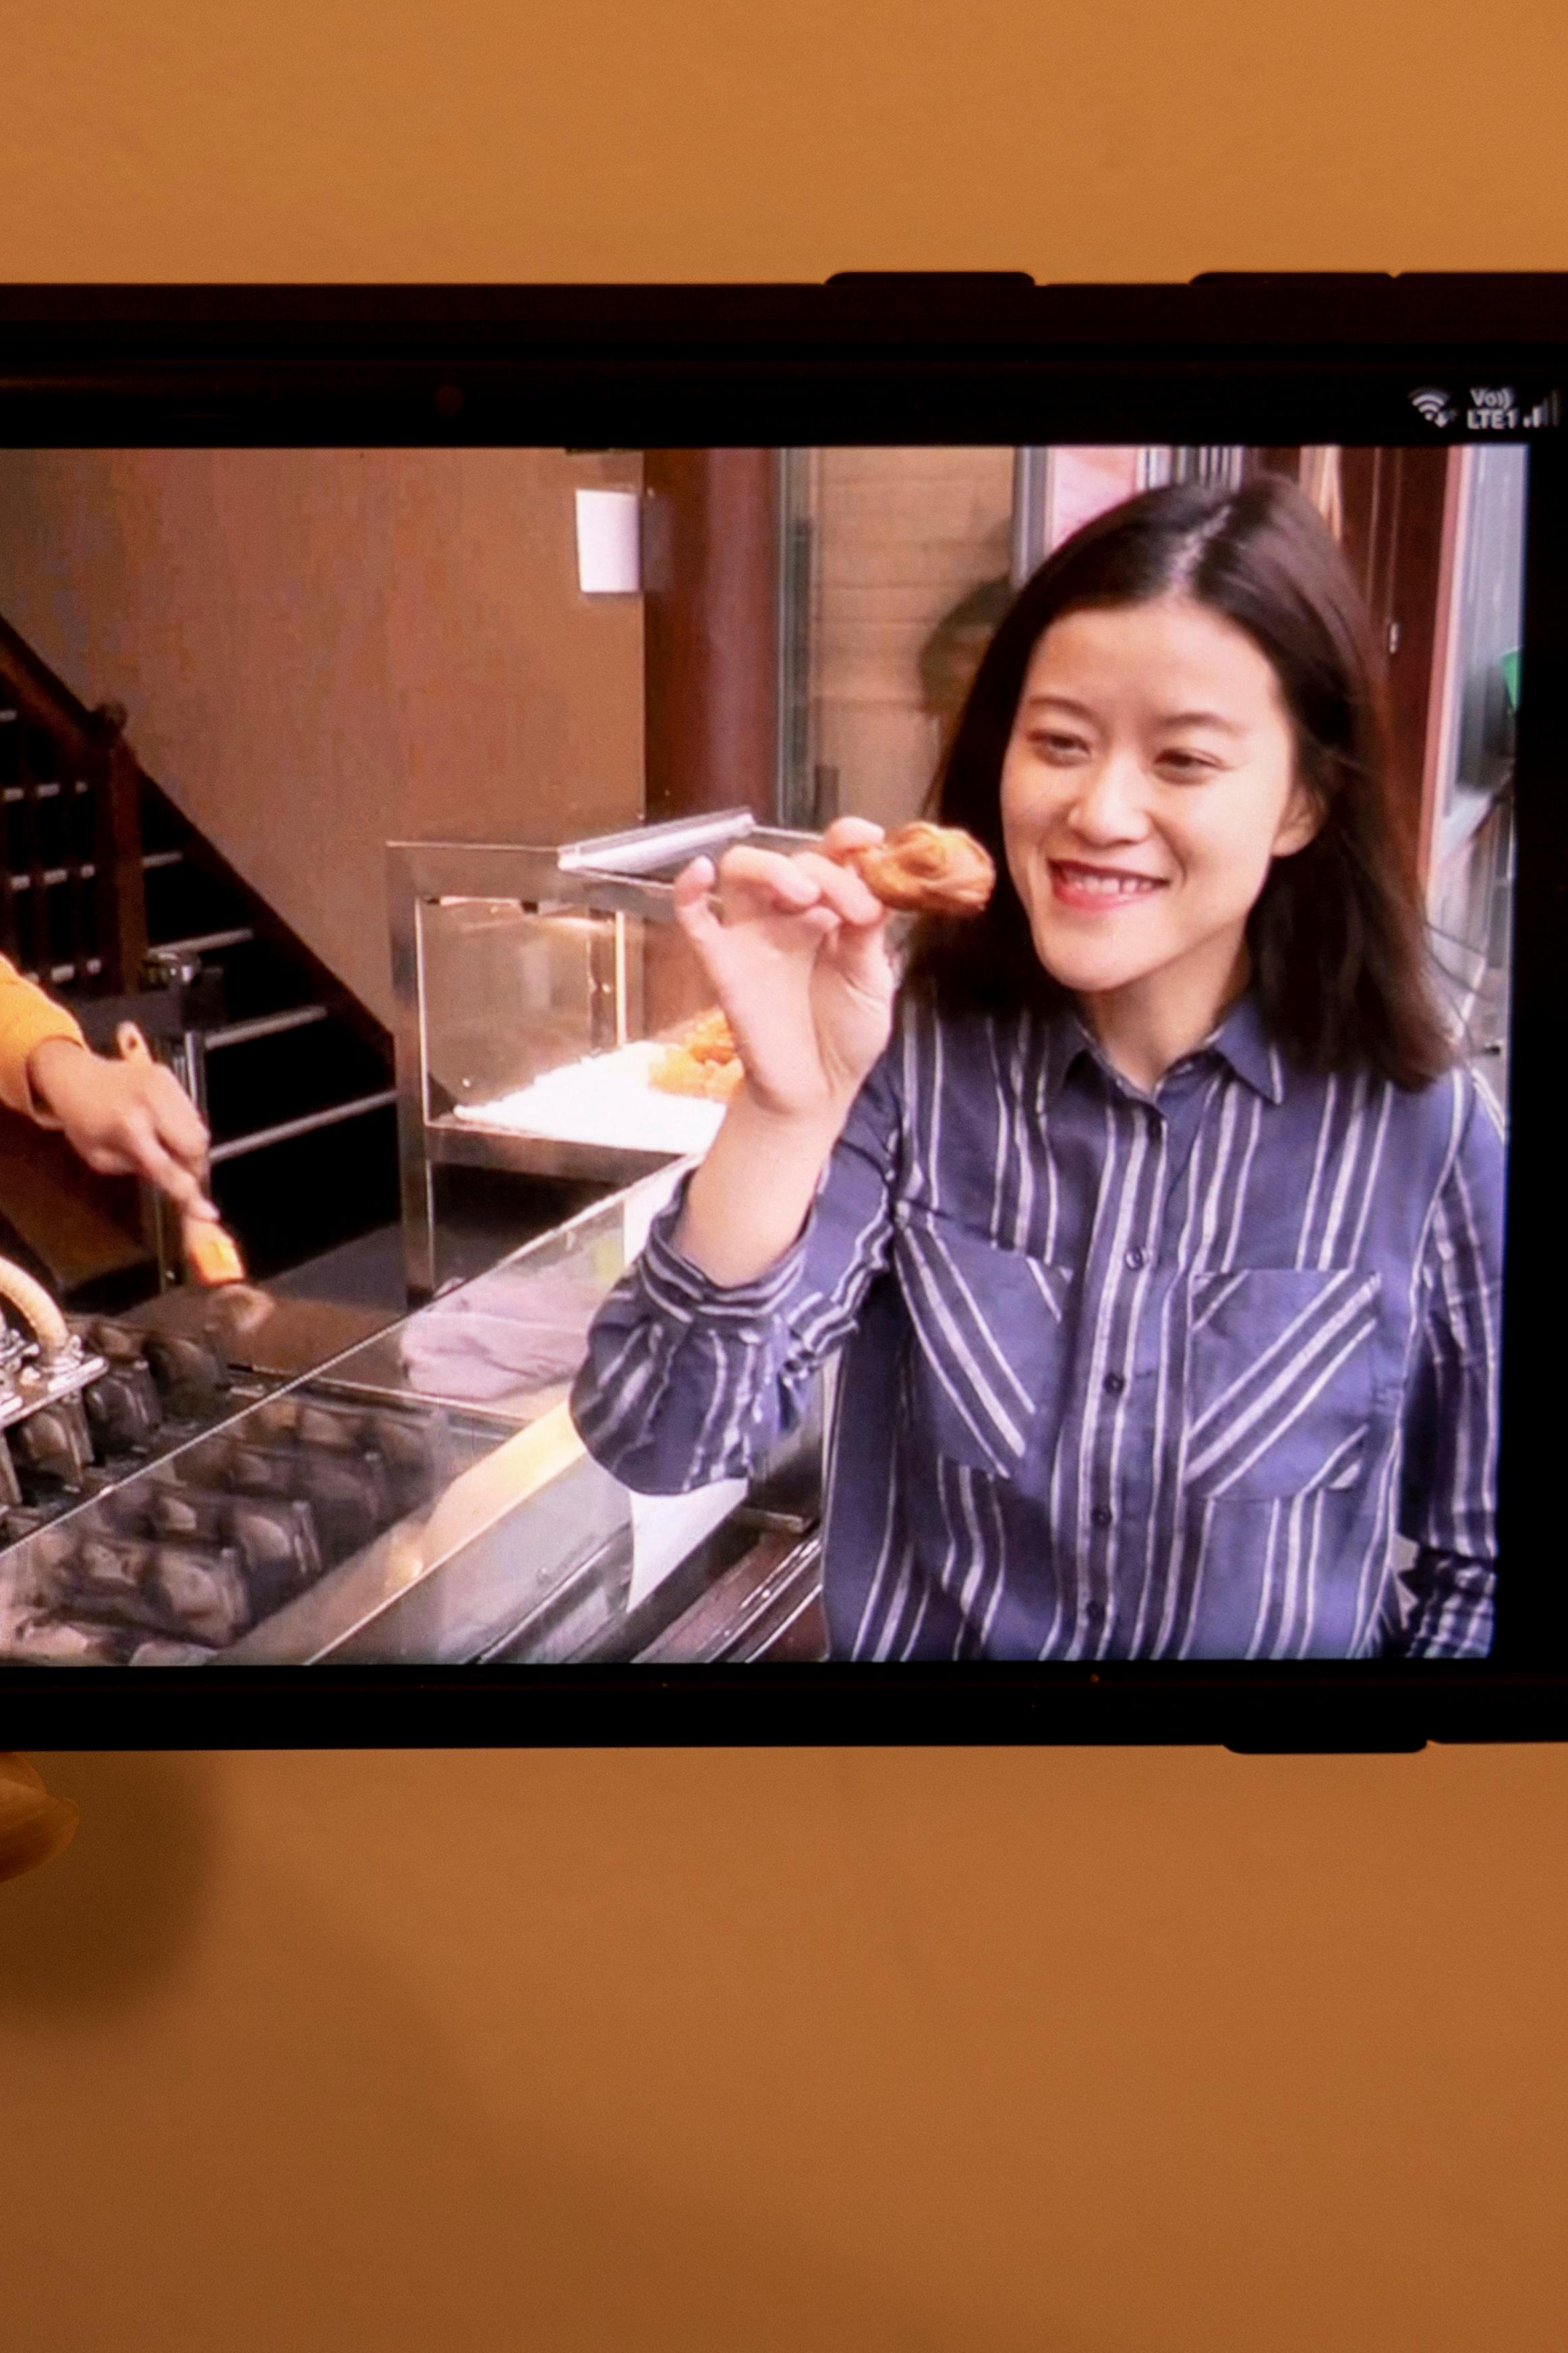 Bakery video